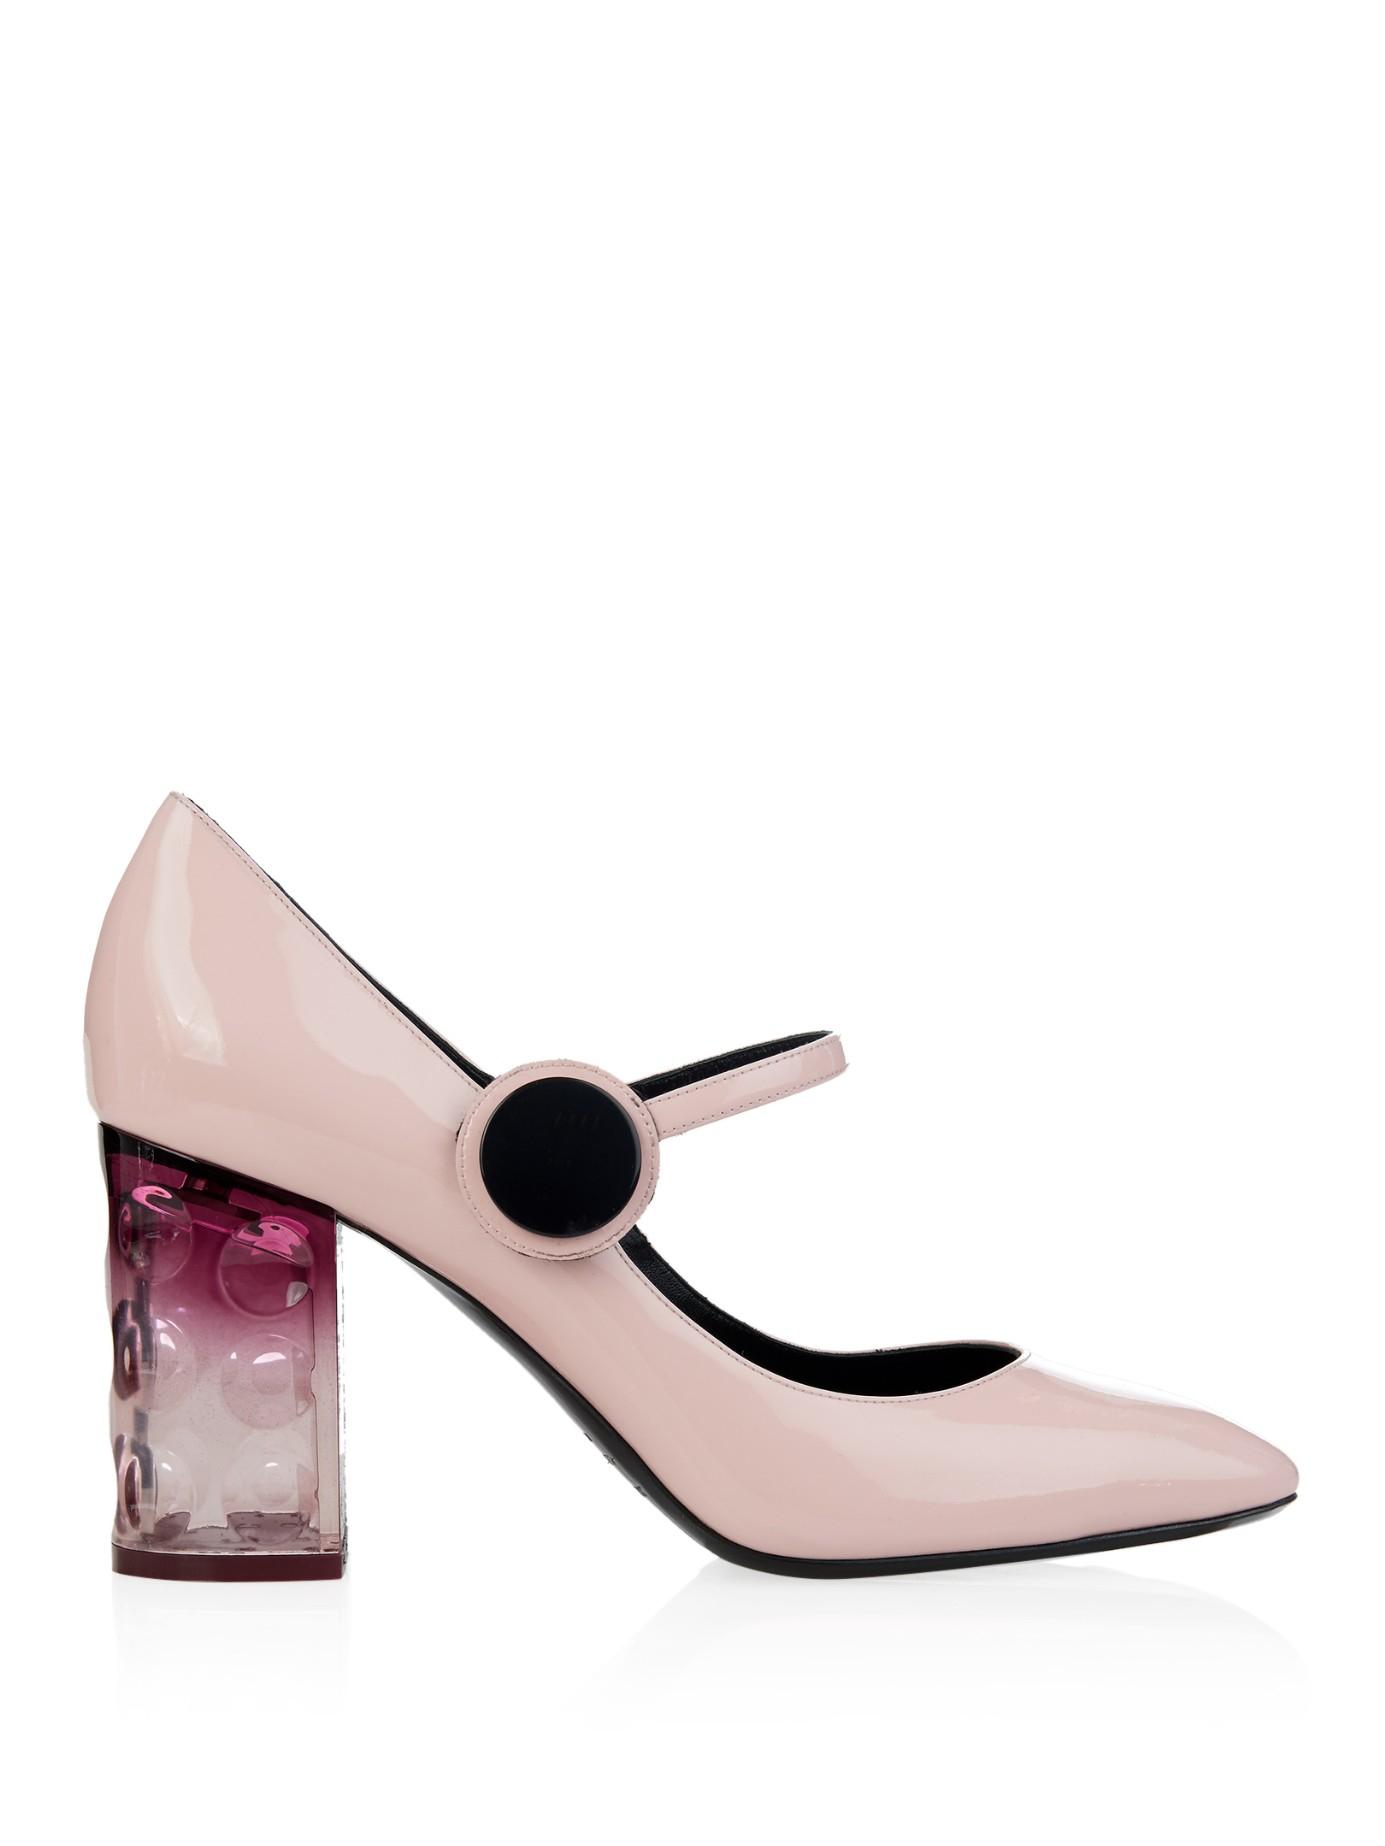 95345727198f Lyst - Nicholas Kirkwood Carnaby Patent-Leather Block-Heel Pumps in Pink